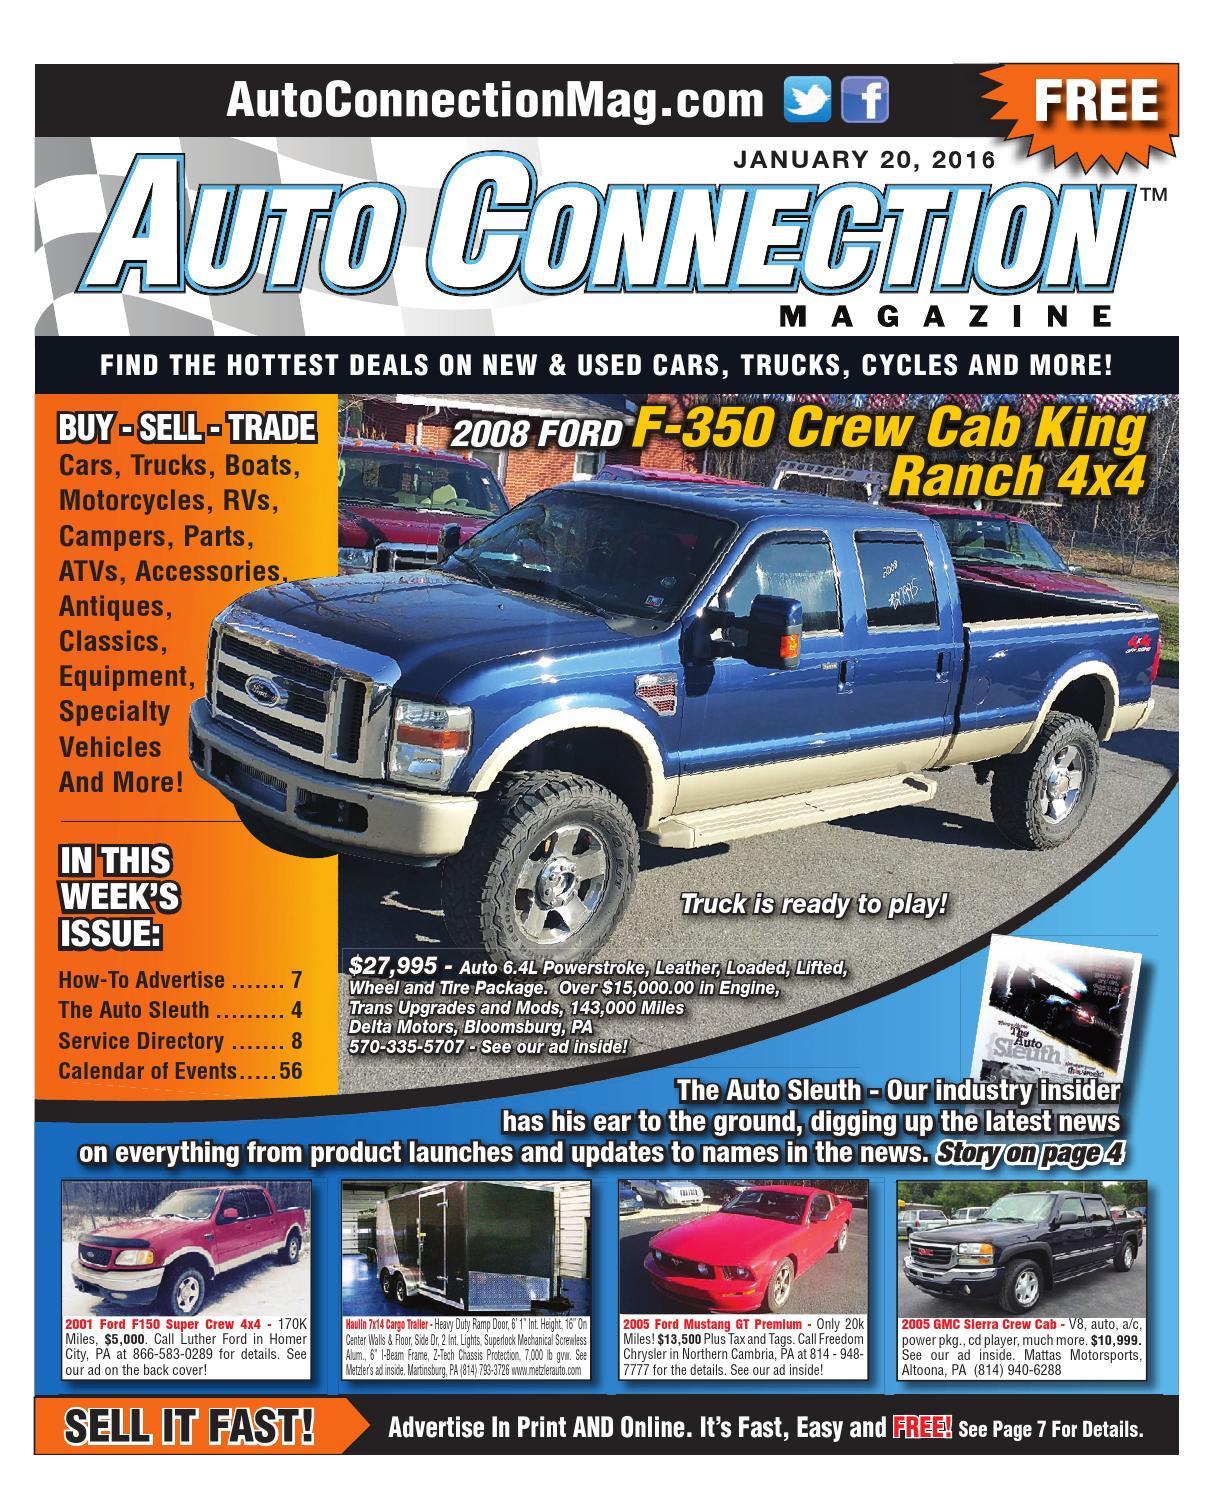 01 20 16 auto connection magazine by auto connection magazine issuu publicscrutiny Images